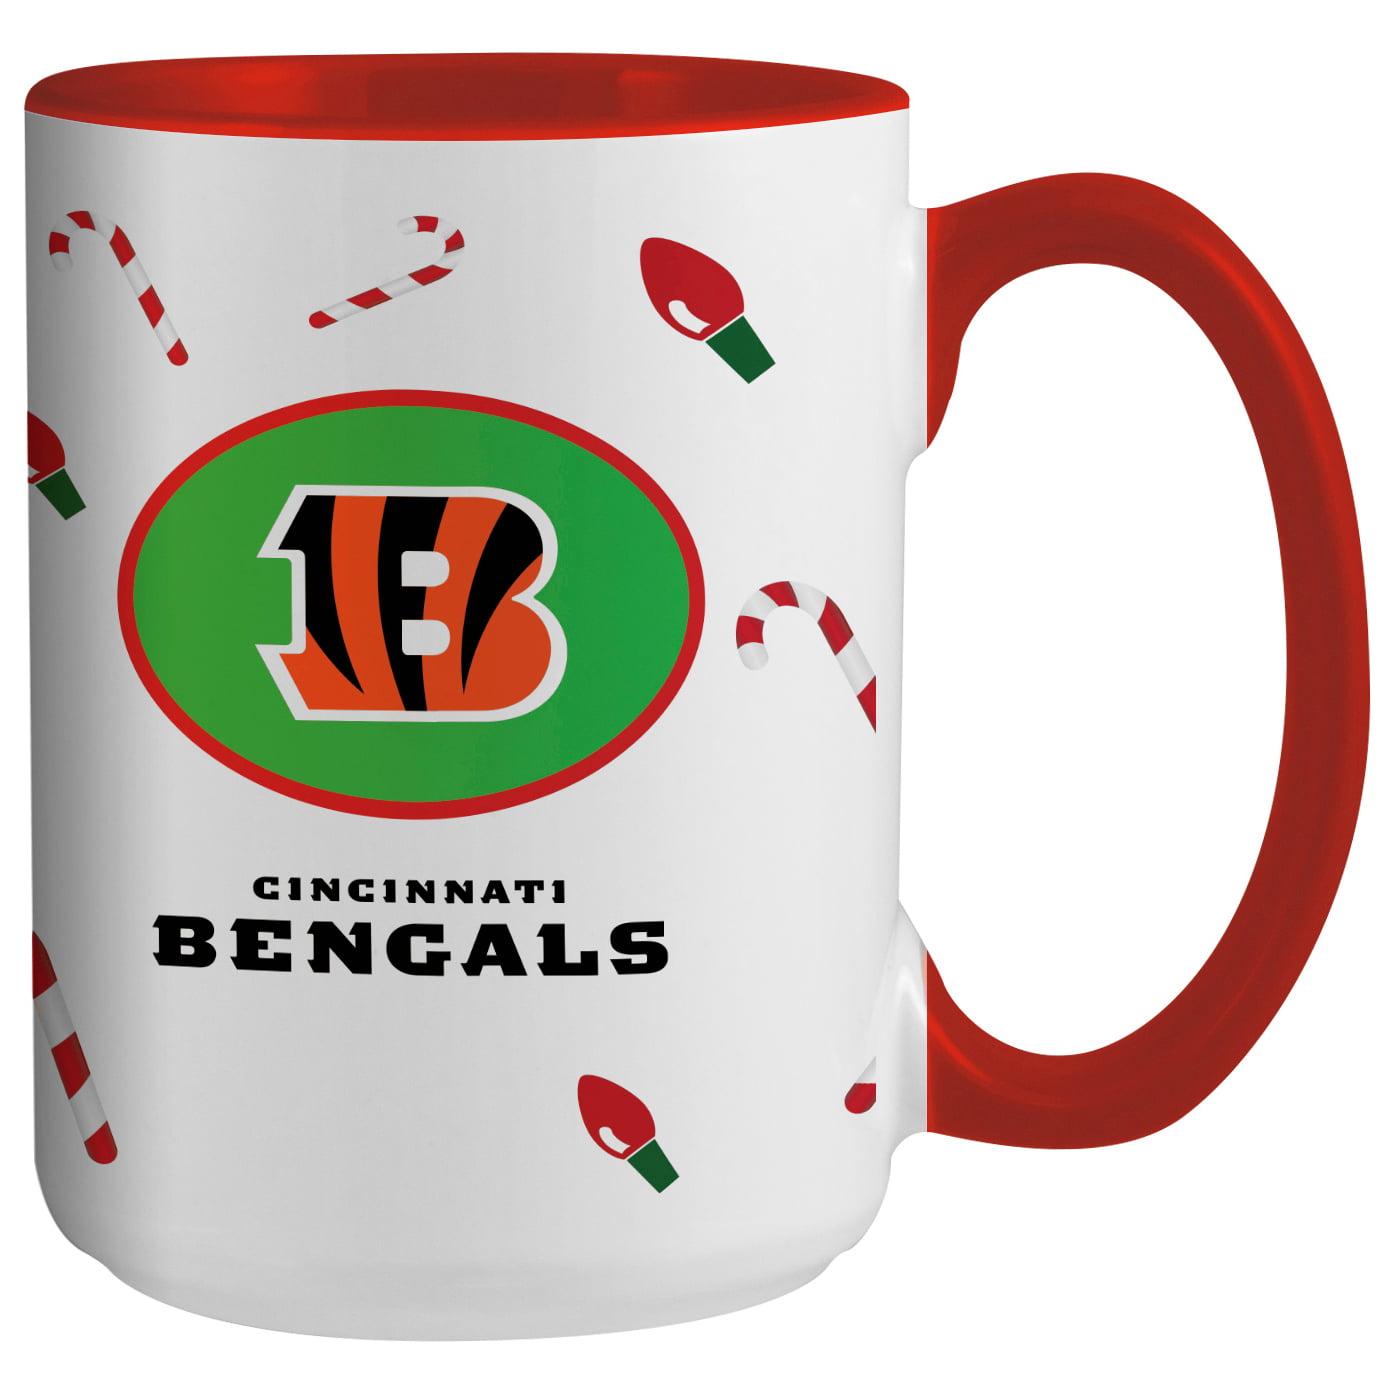 Cincinnati Bengals 15oz. Holiday Mug - No Size